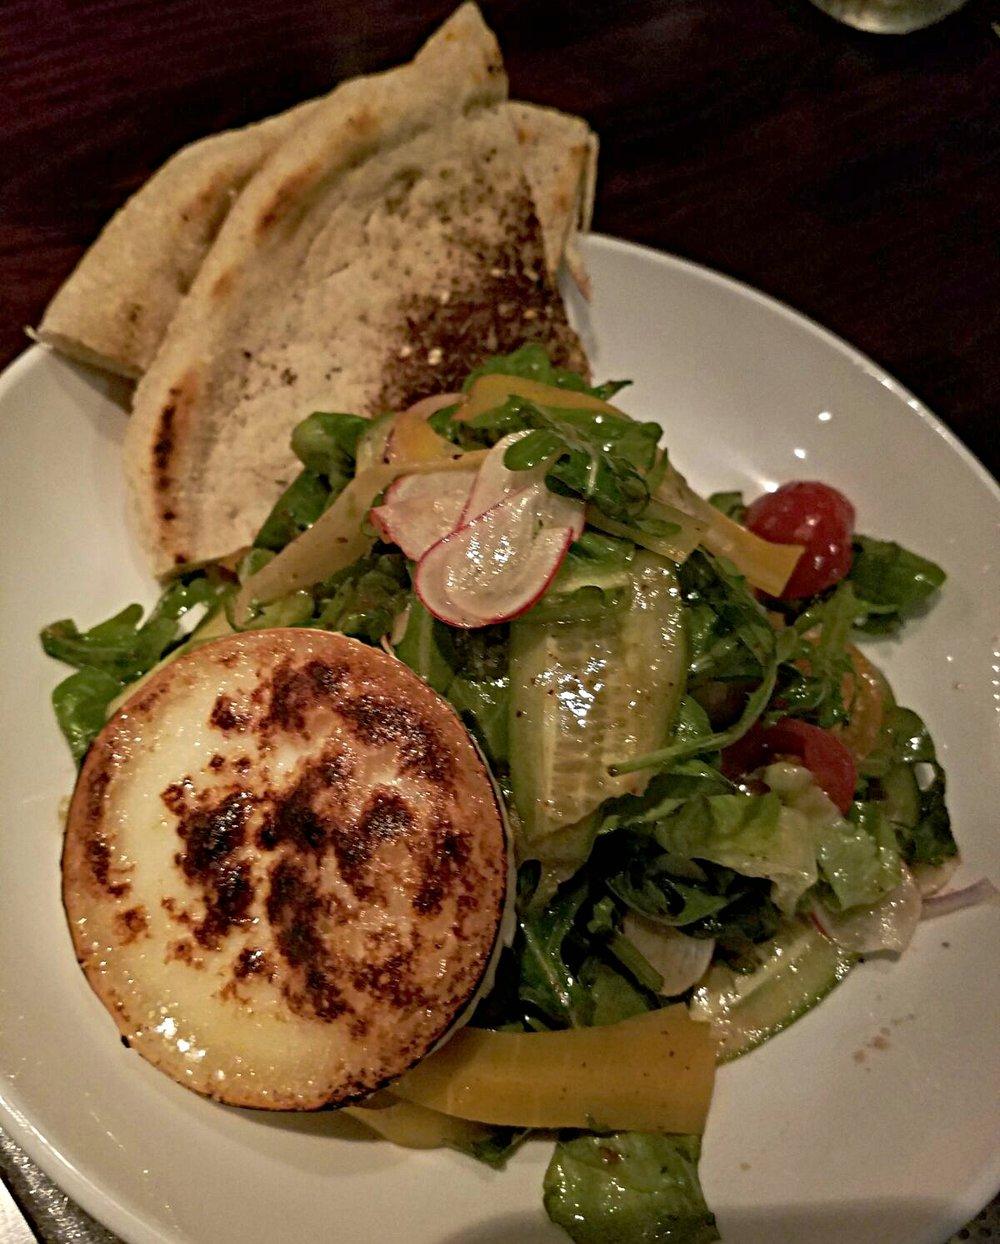 GYPSY SALAD. house veggies. goat cheese. warm pita. lemon-sumac dressing. :  UNDER THE CORK TREE.